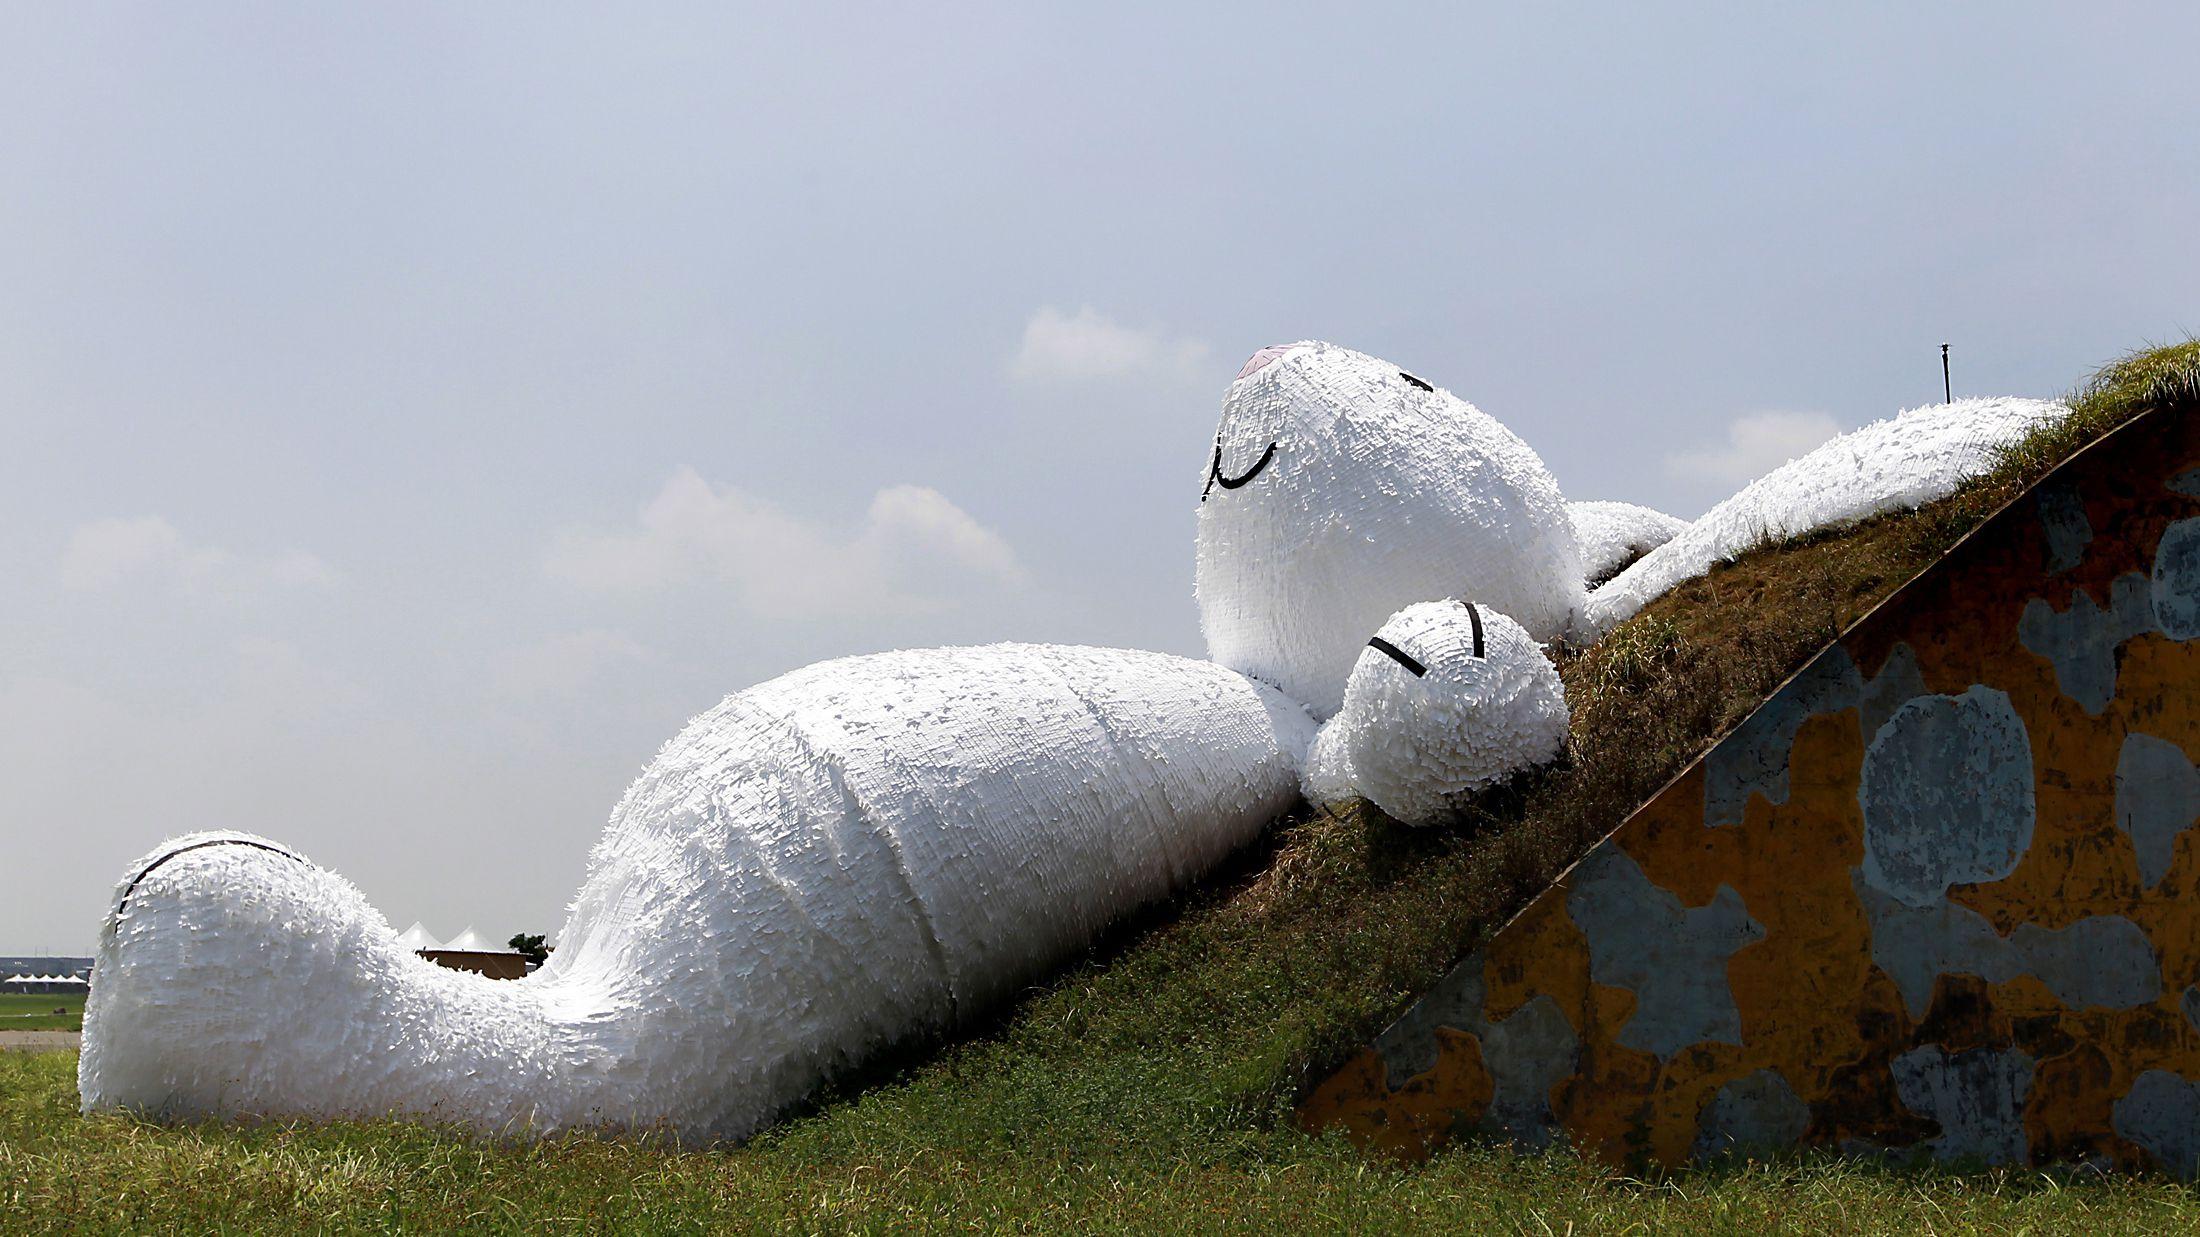 Florentijn Hofman's giant rabbit art installation in Taiwan.